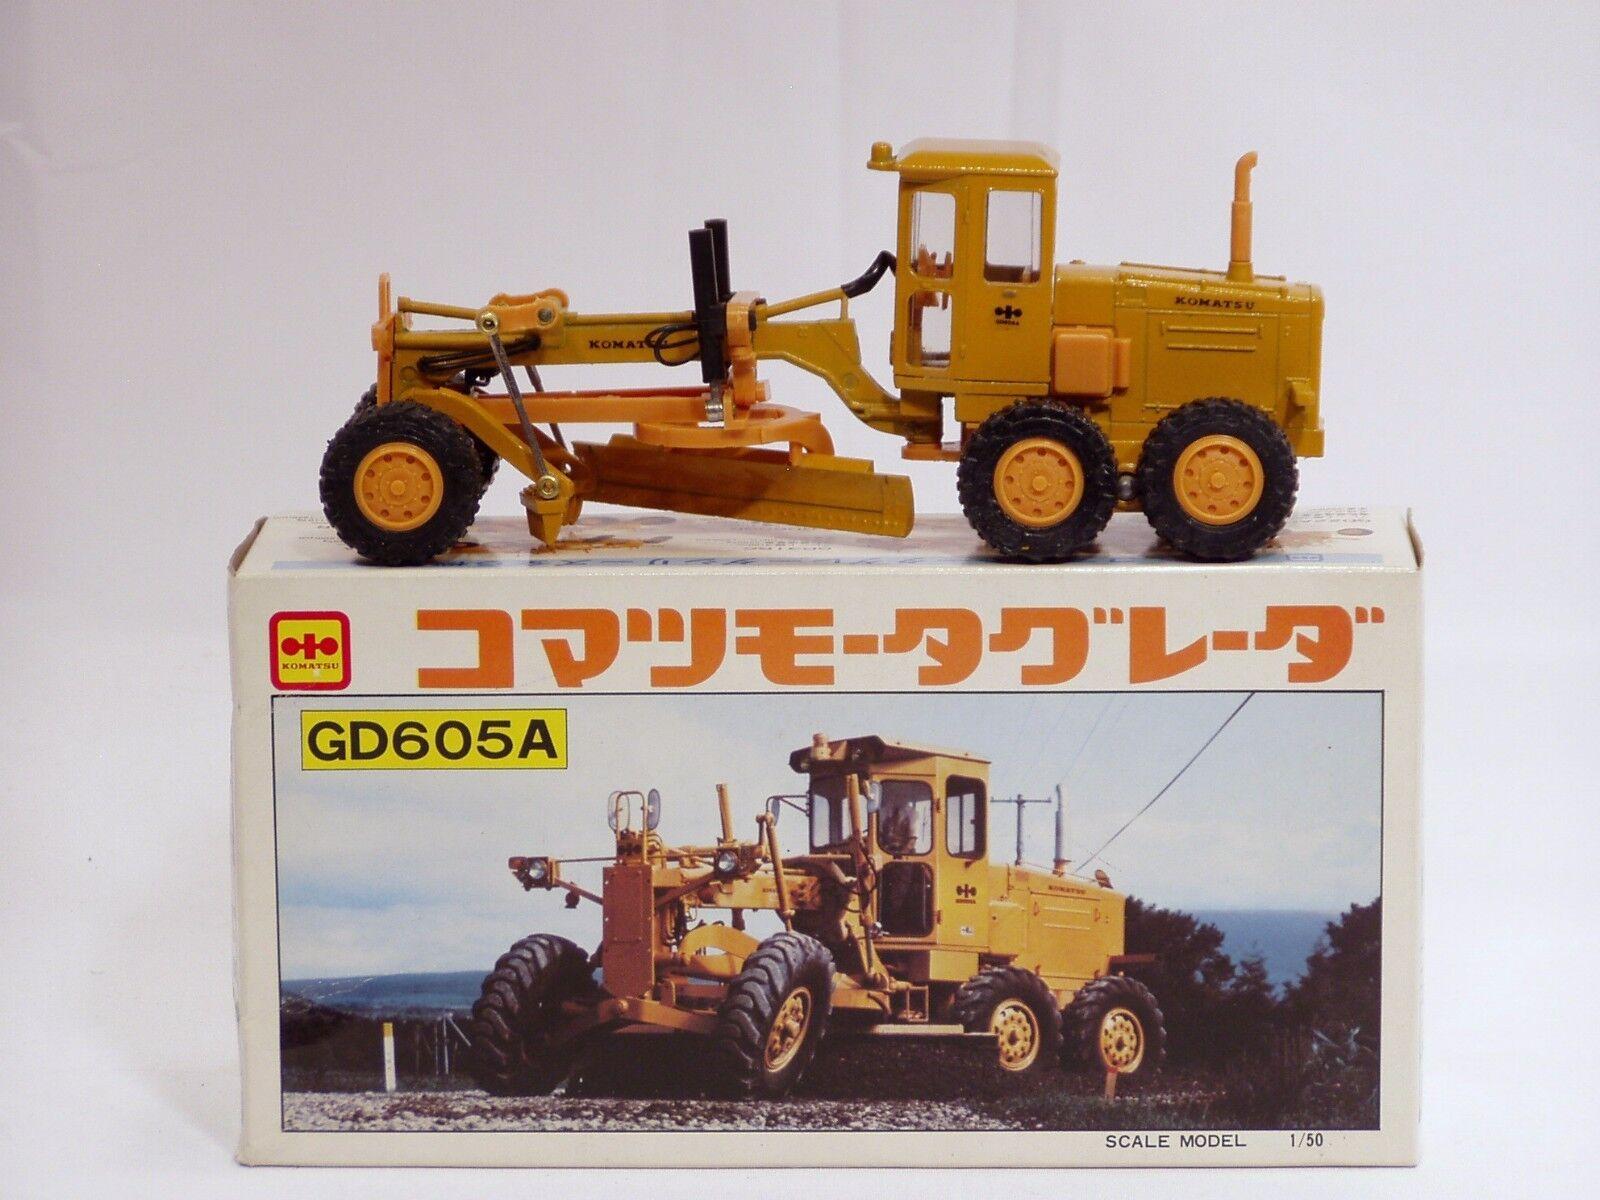 Komatsu GD605A Grader-N C -  1 50 - DIAPET YONEZAWA  T-74 - Comme neuf IN BOX  détaillant de fitness